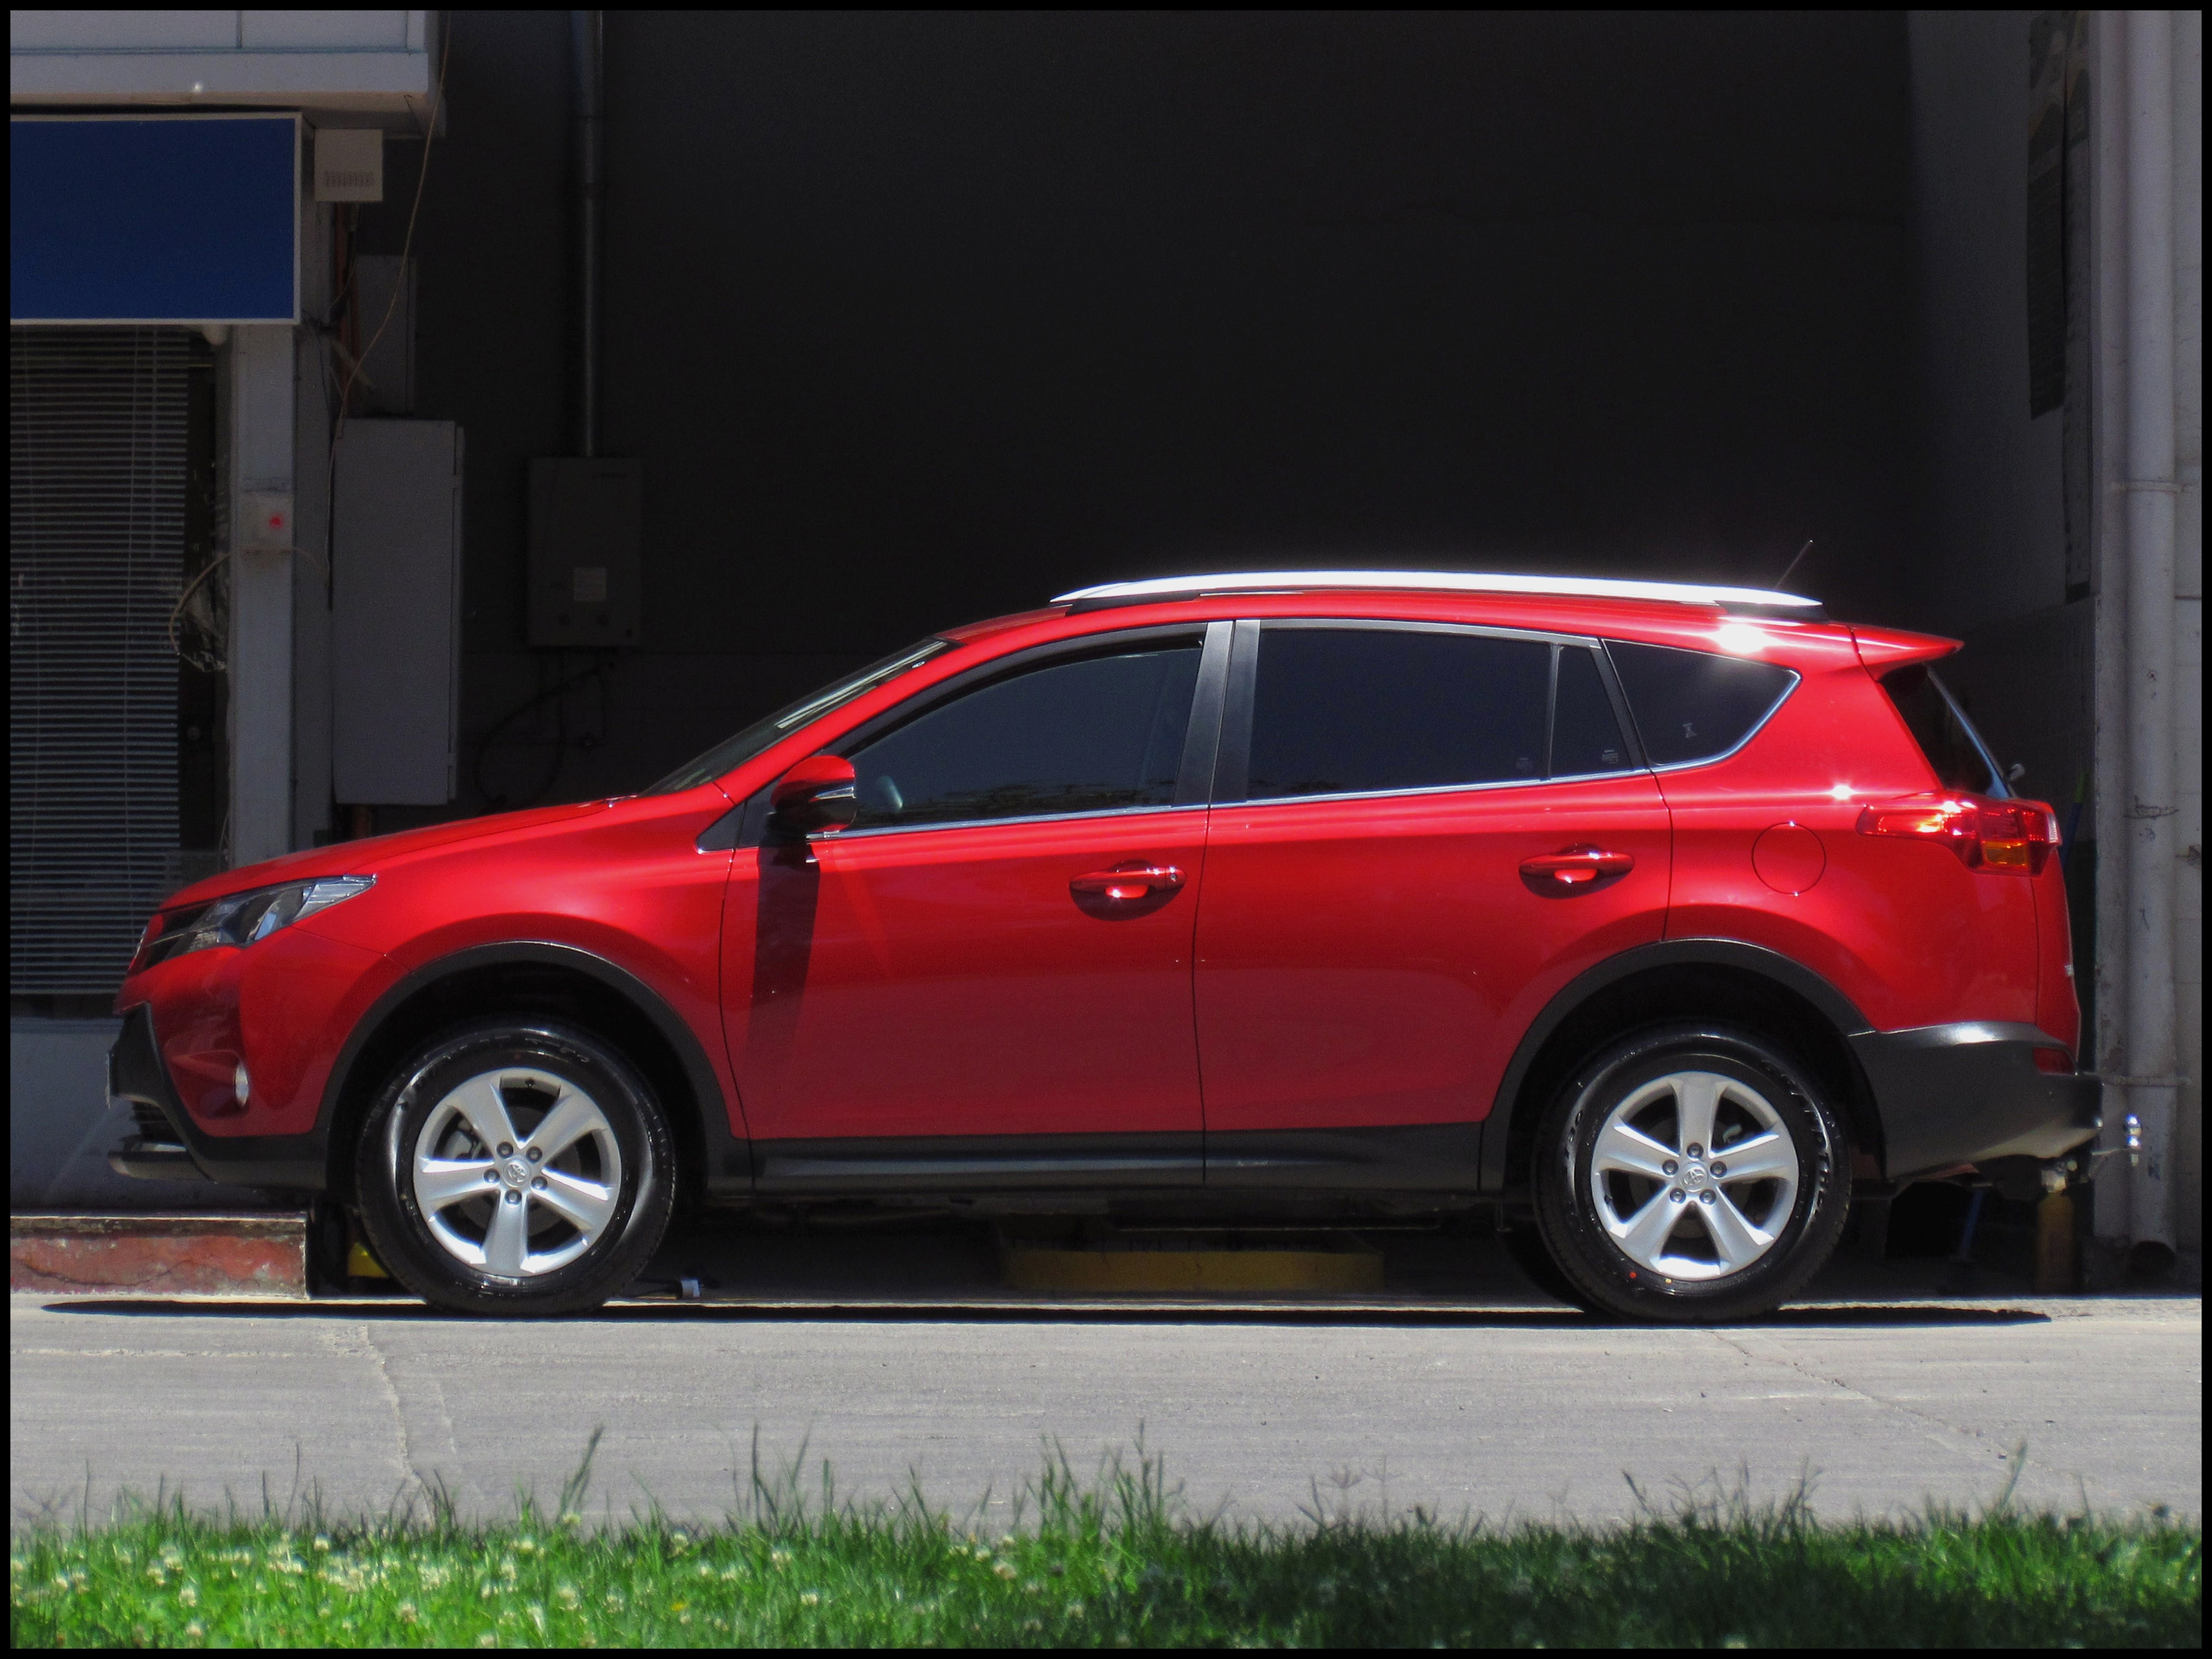 Toyota Rav4 Reliability Lovely News Rav 4 Logo toyota Rav4 Interior Best 15 Best